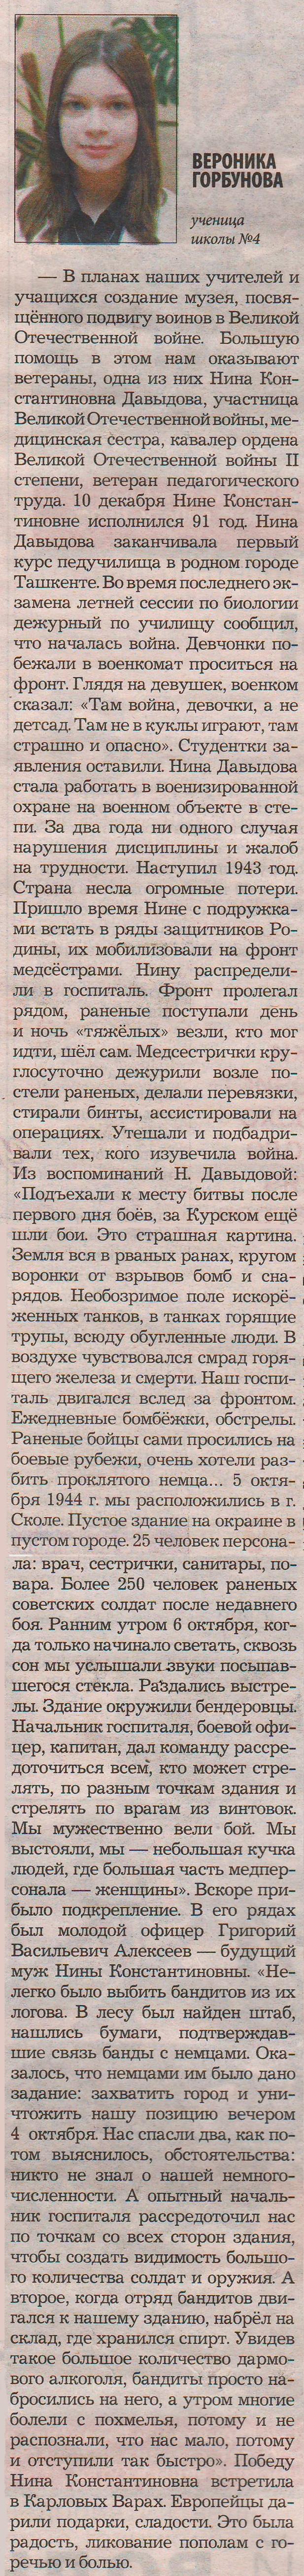 Скан. док.0102